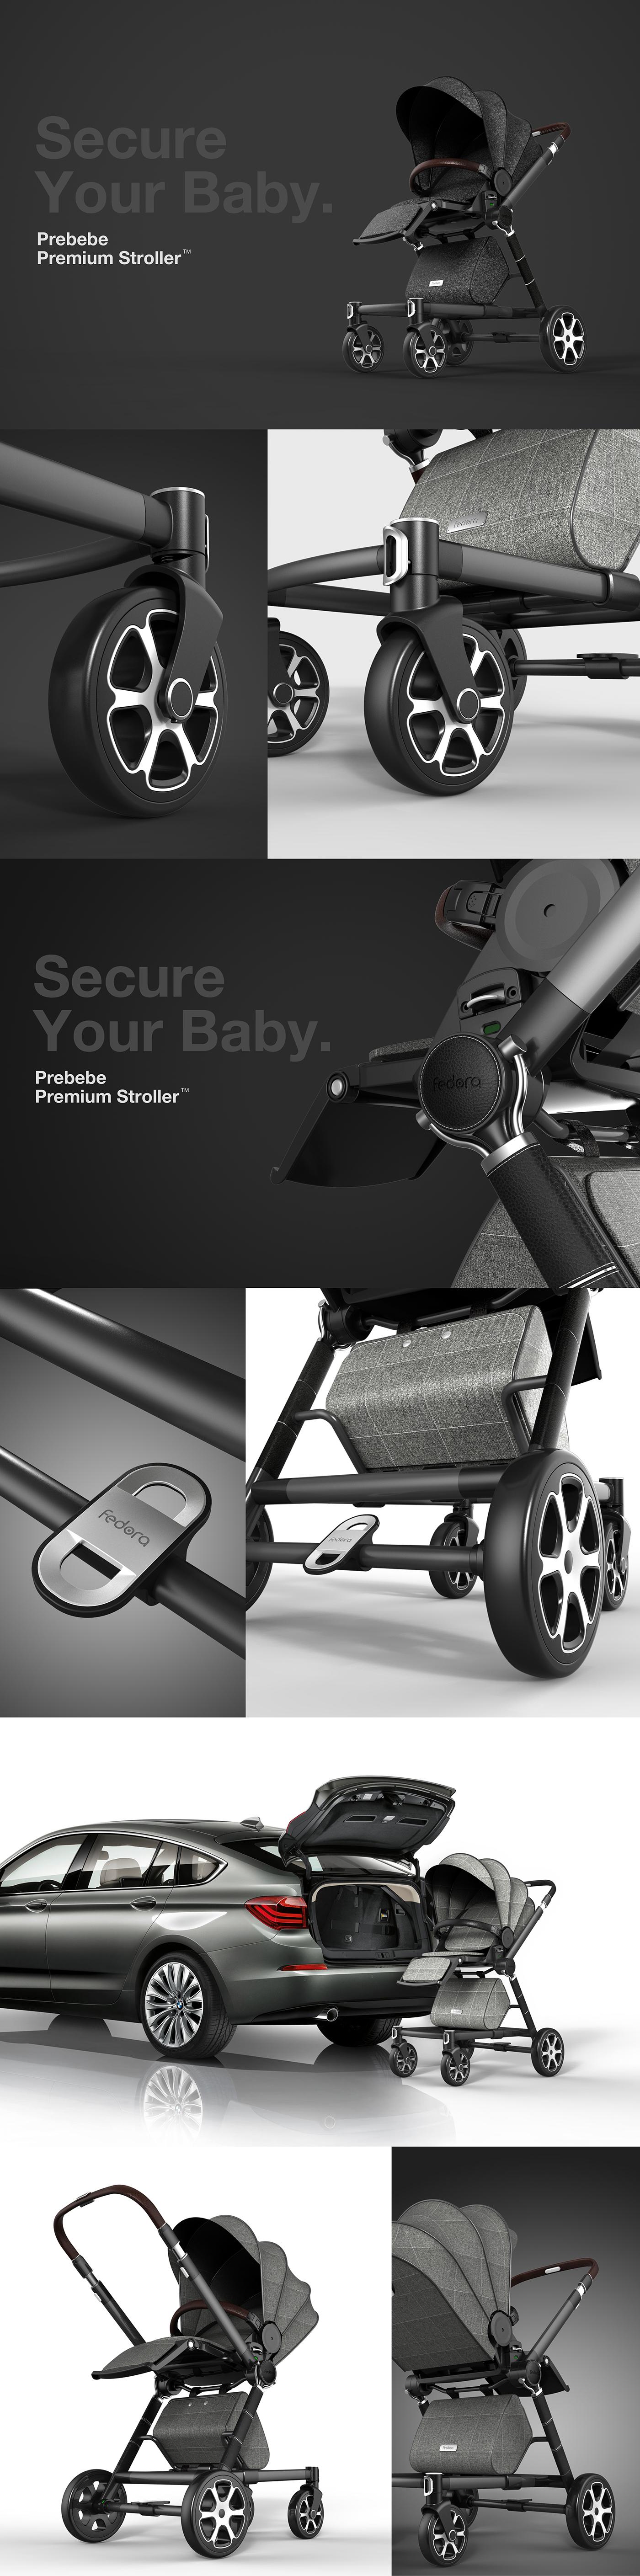 69bfa754455875 595c4da8d9a2b Jpg 1 400 5 635 Pixels Design Theory Stroller Medical Design